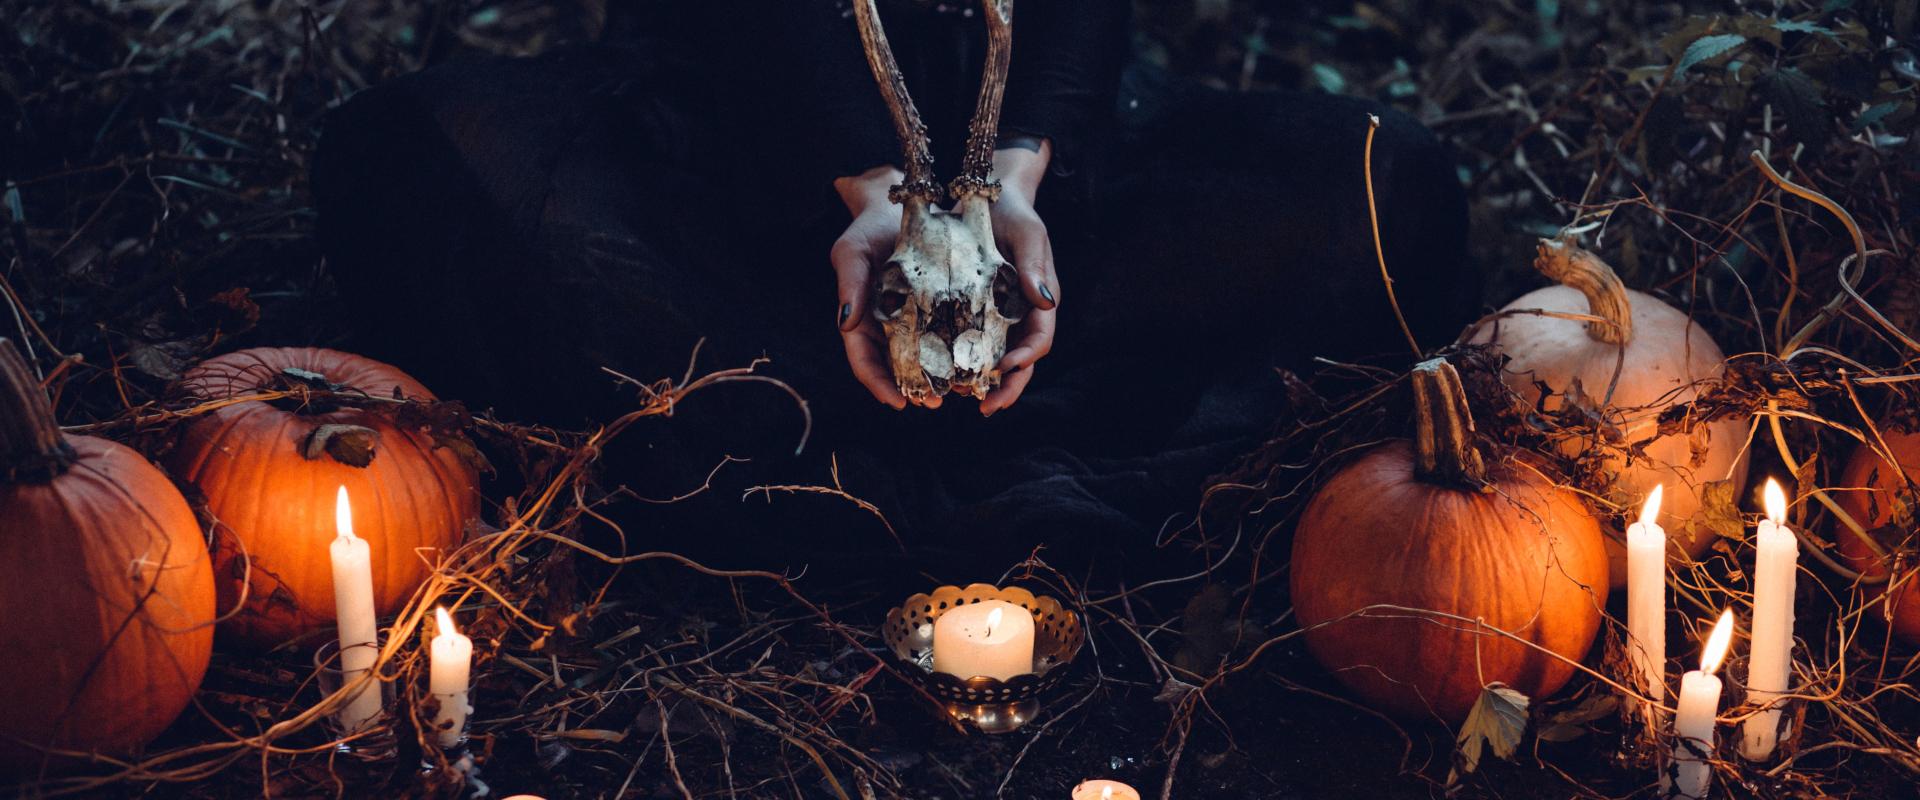 A Tale Of 2 Bridges (Phobophobia - A Hillbillies Halloween)